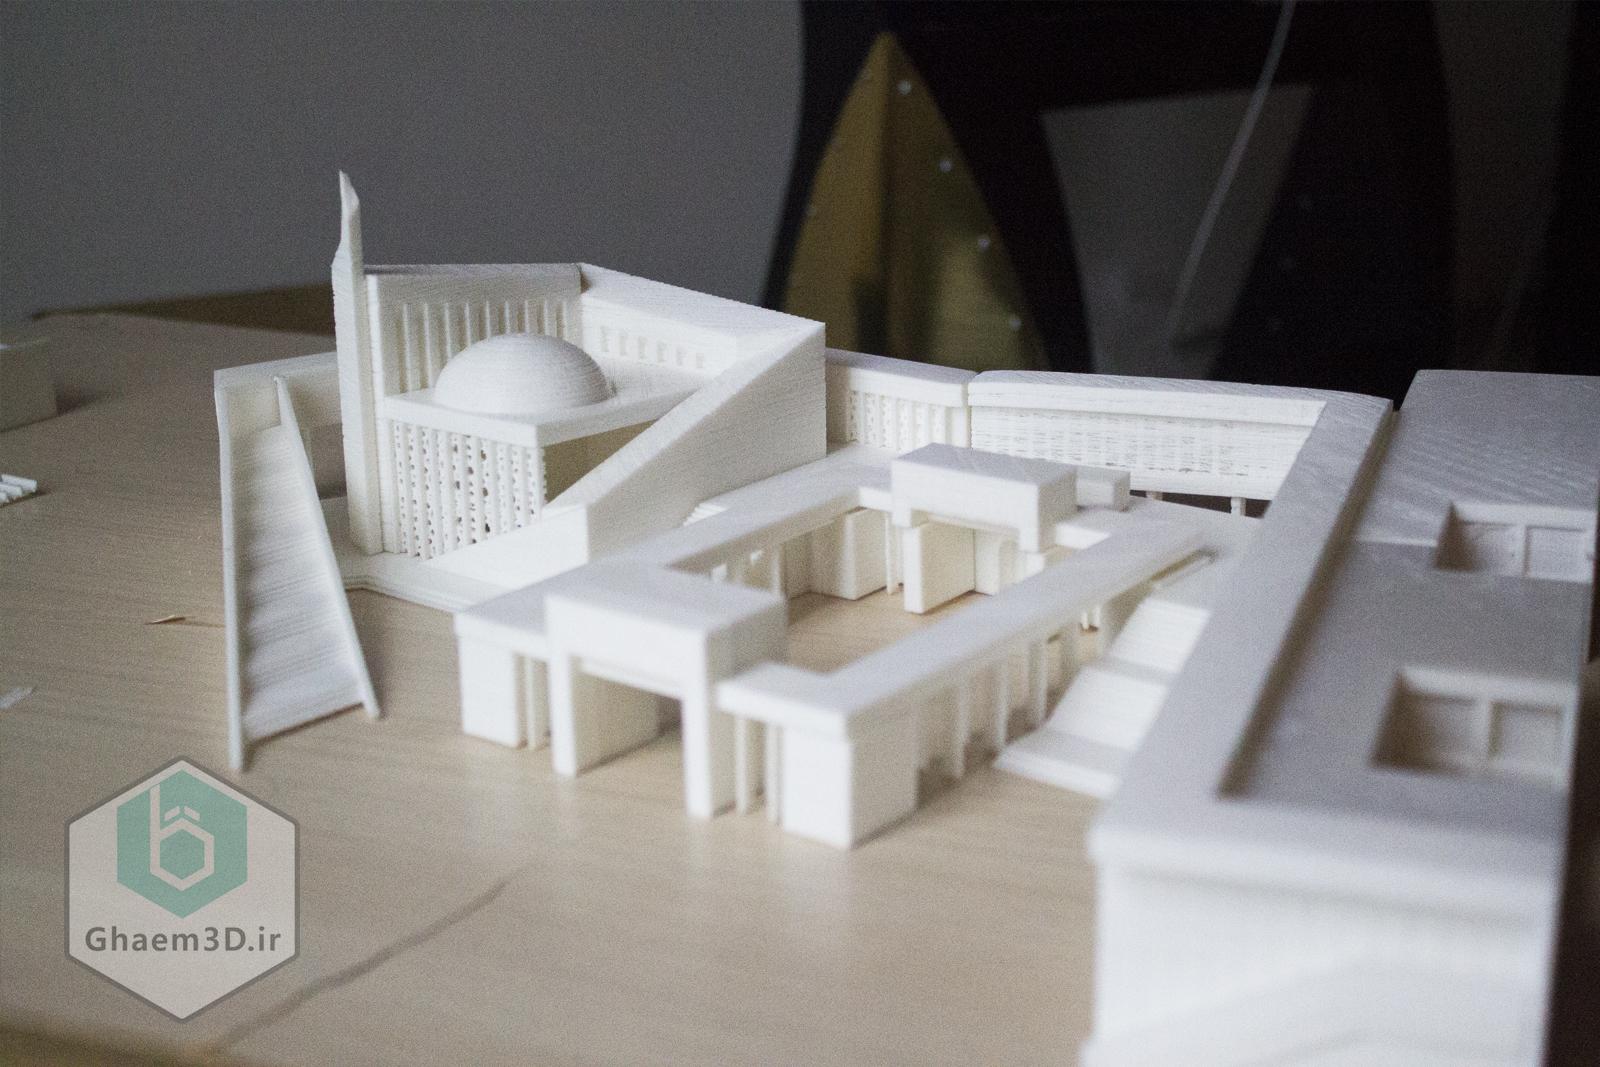 پرینتر سه بعدی مشهد ماکت معماری